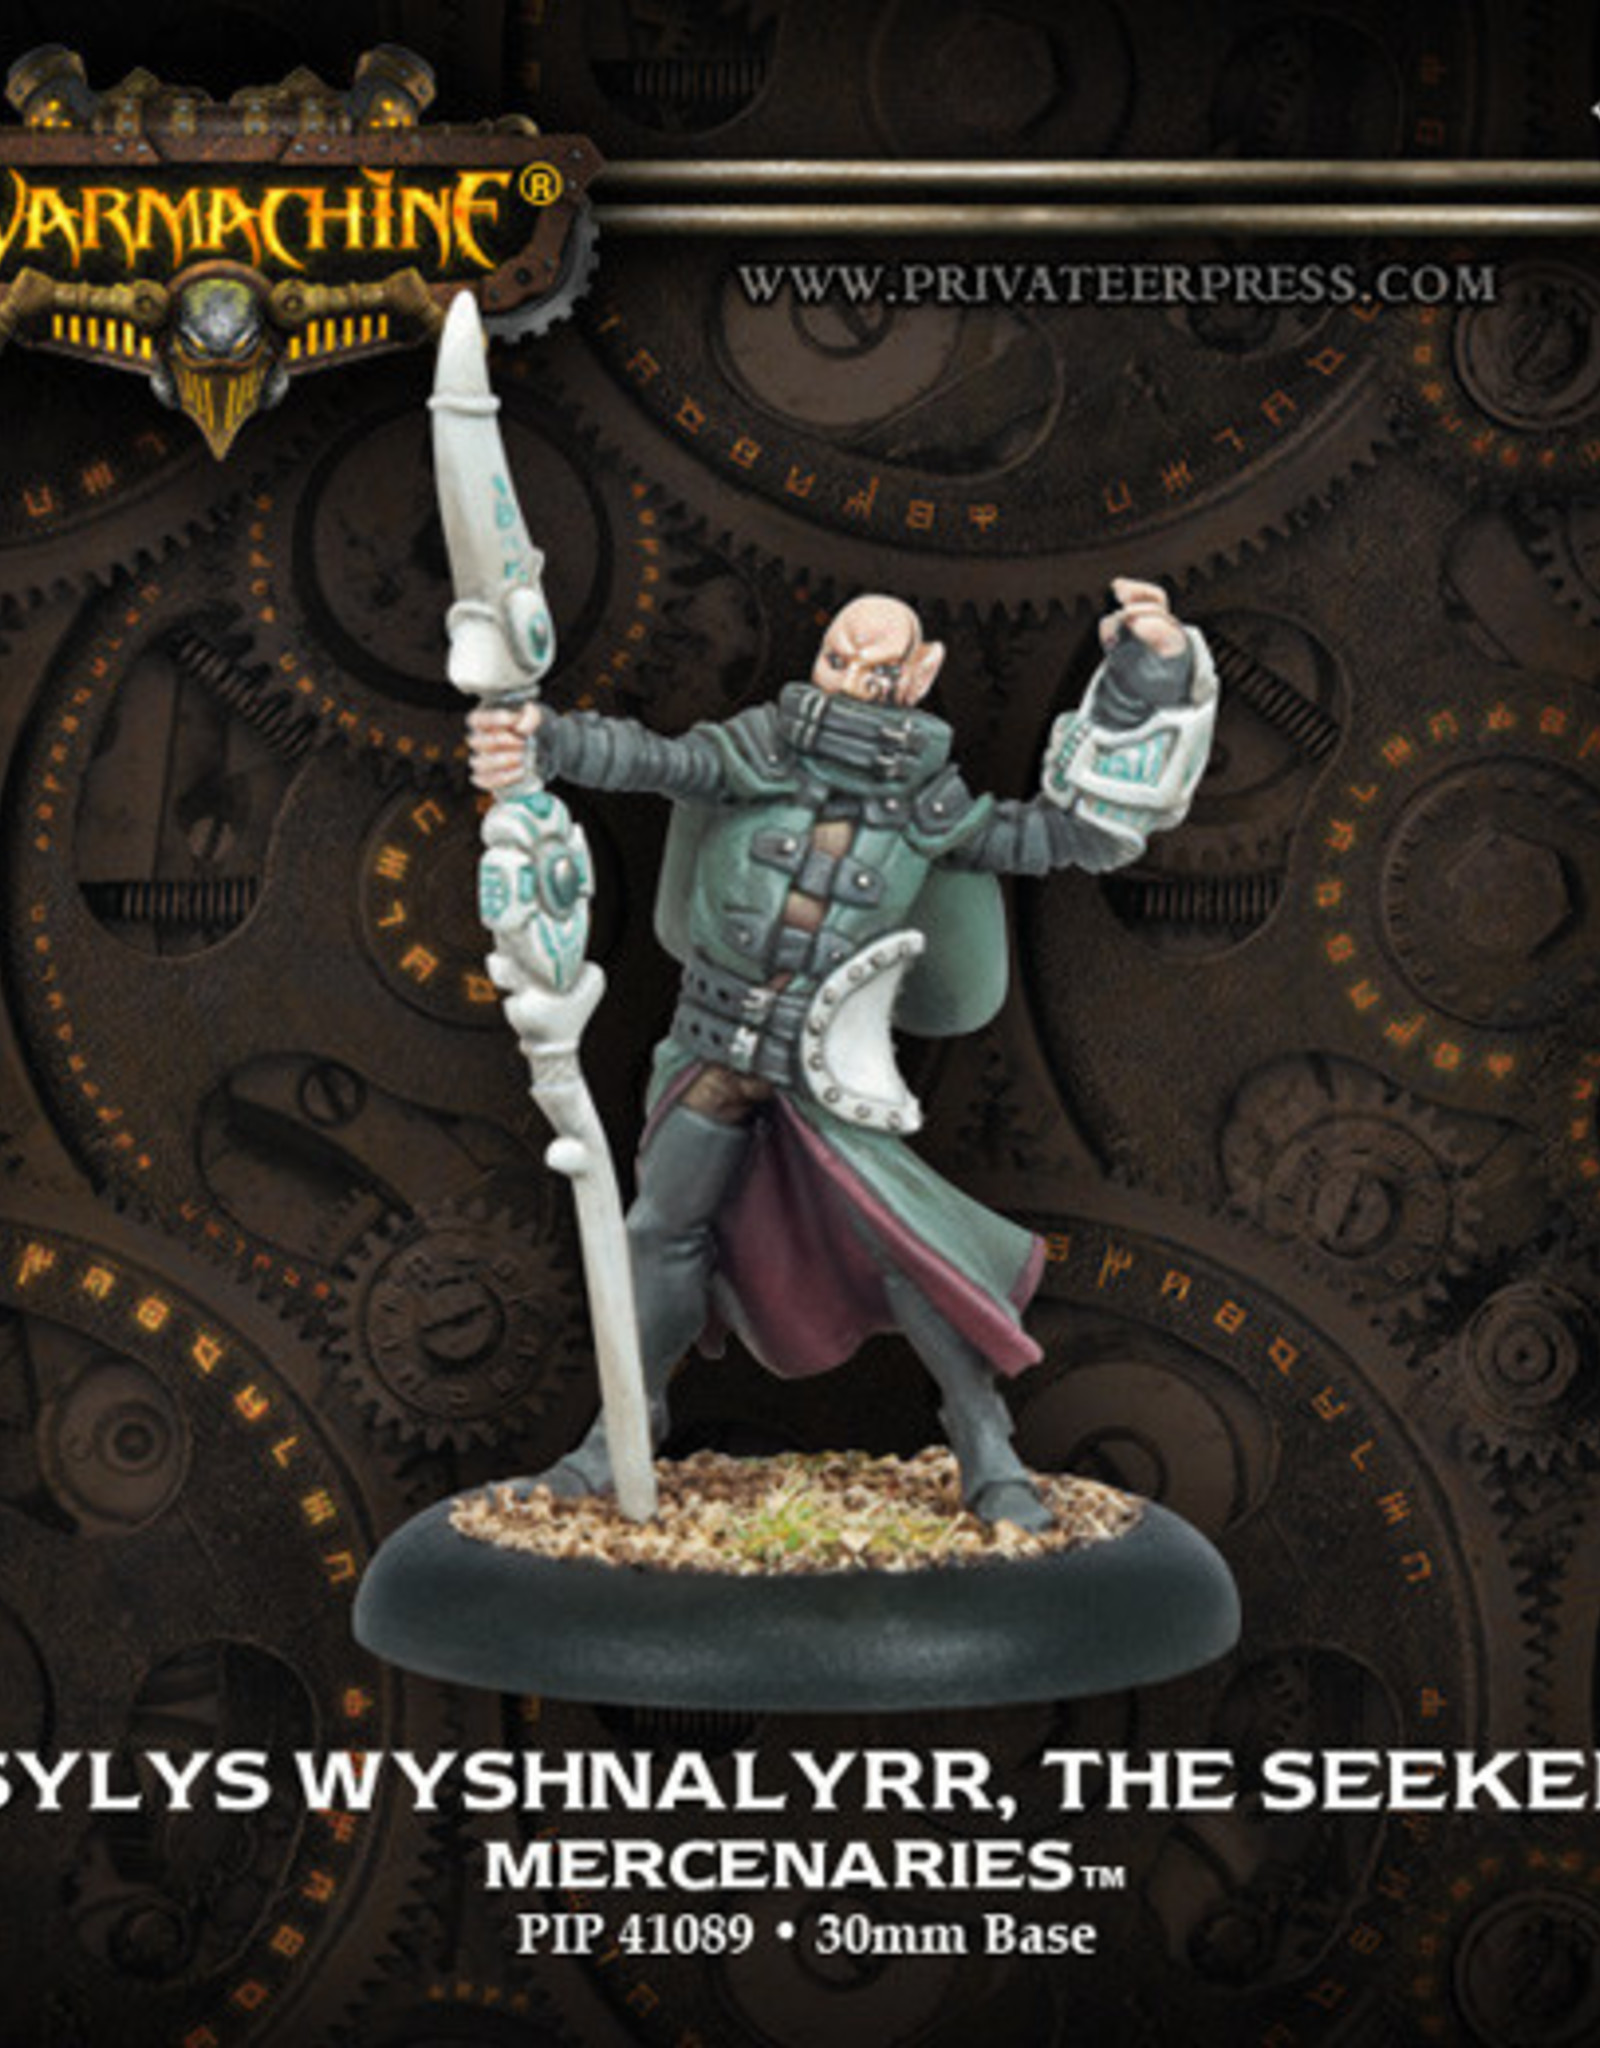 Warmachine Mercenaries - Sylas Wyshnalyrr